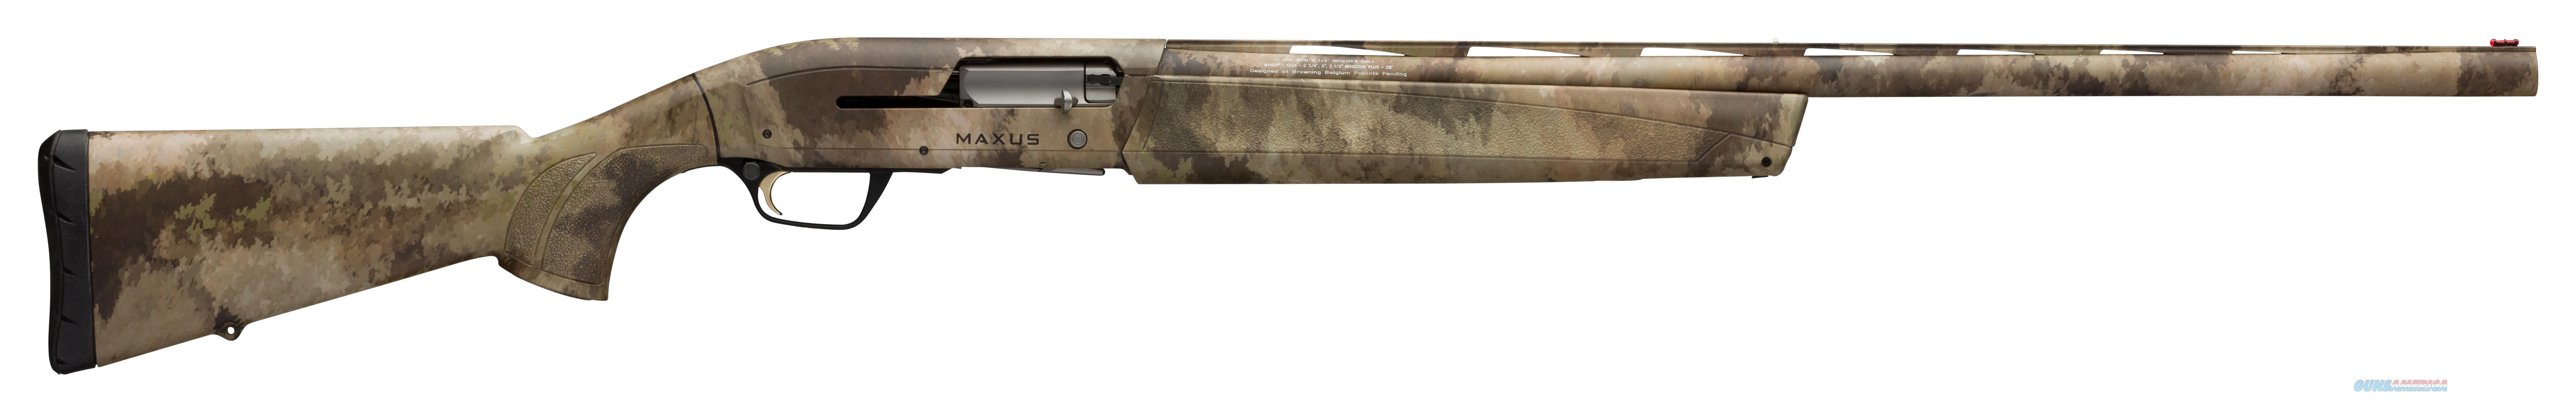 "Browning 011669204 Maxus Semi-Automatic 12Ga 28"" 3.5"" Camouflage Synthetic Stk/Aluminum Alloy Rcvr 011669204  Guns > Shotguns > B Misc Shotguns"